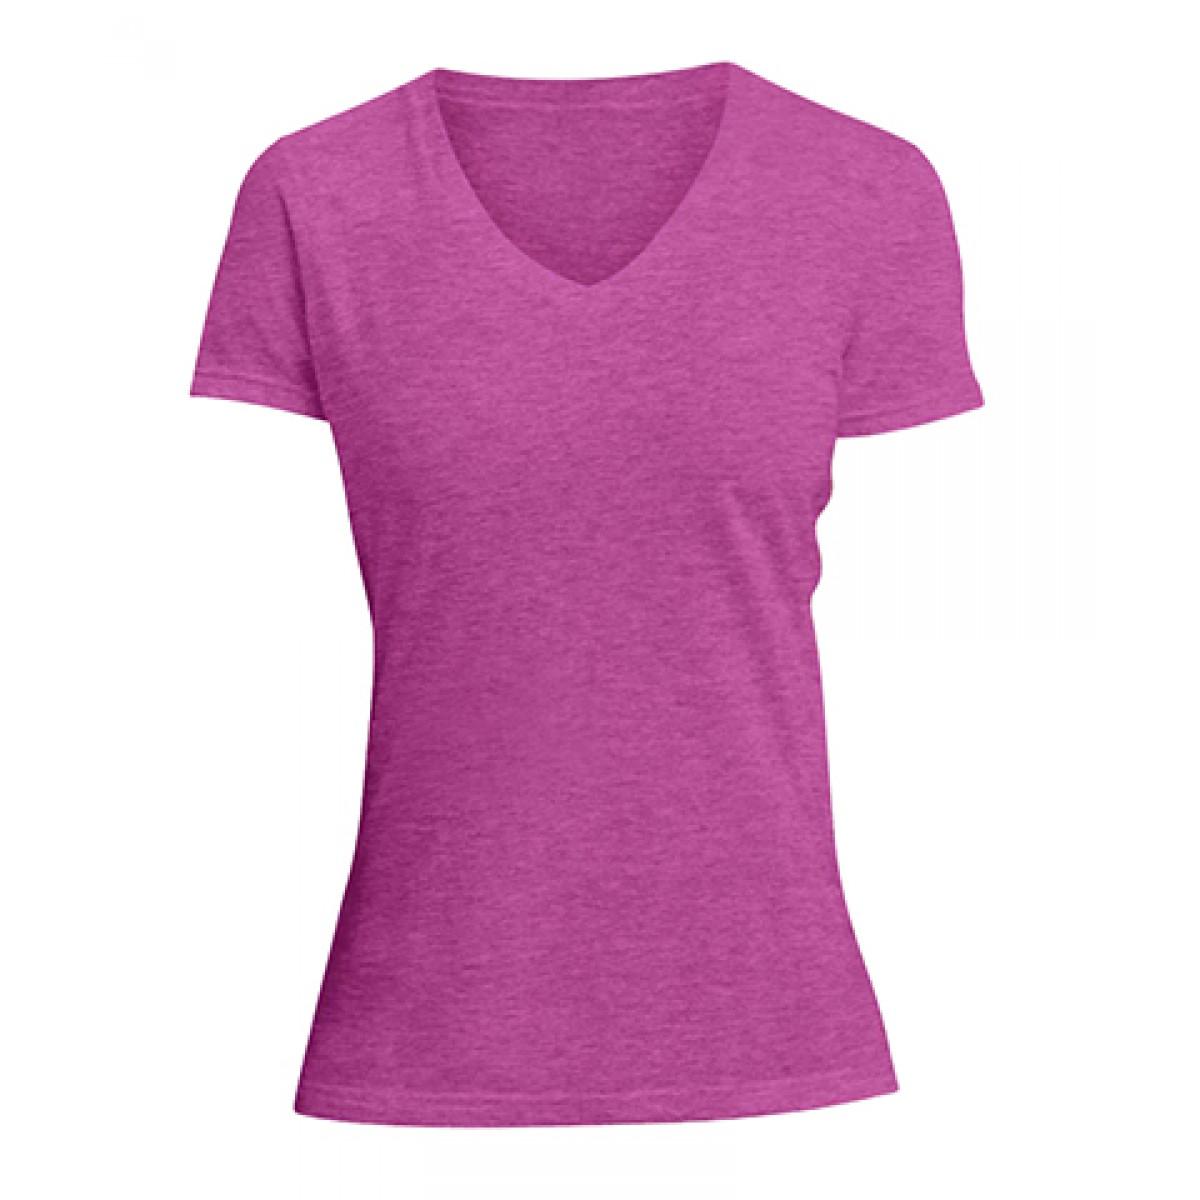 Ladies V-Neck Tee-Heathered Fuscia-XL